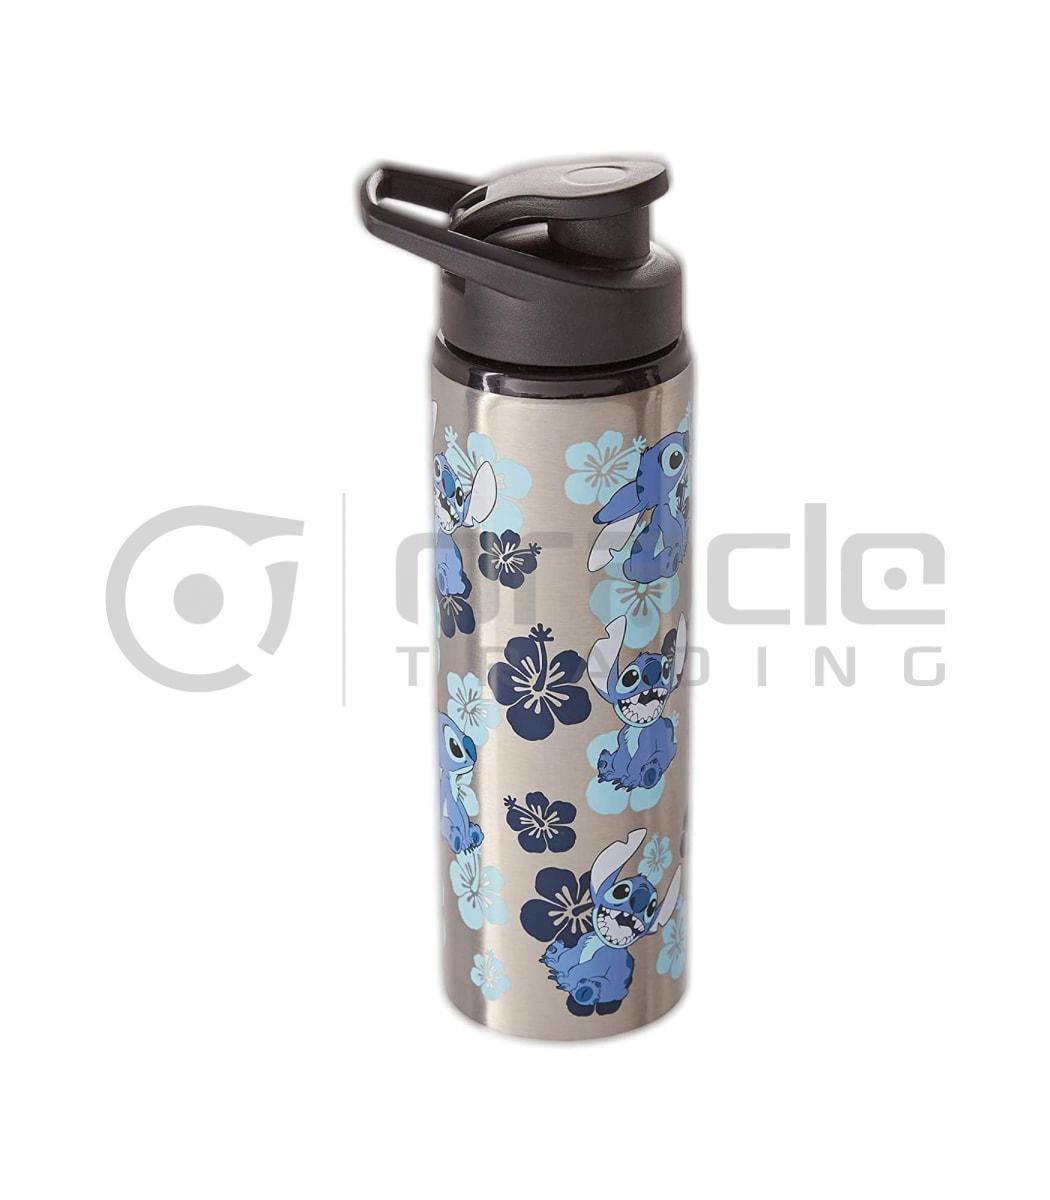 Lilo & Stitch Water Bottle - Stainless Steel